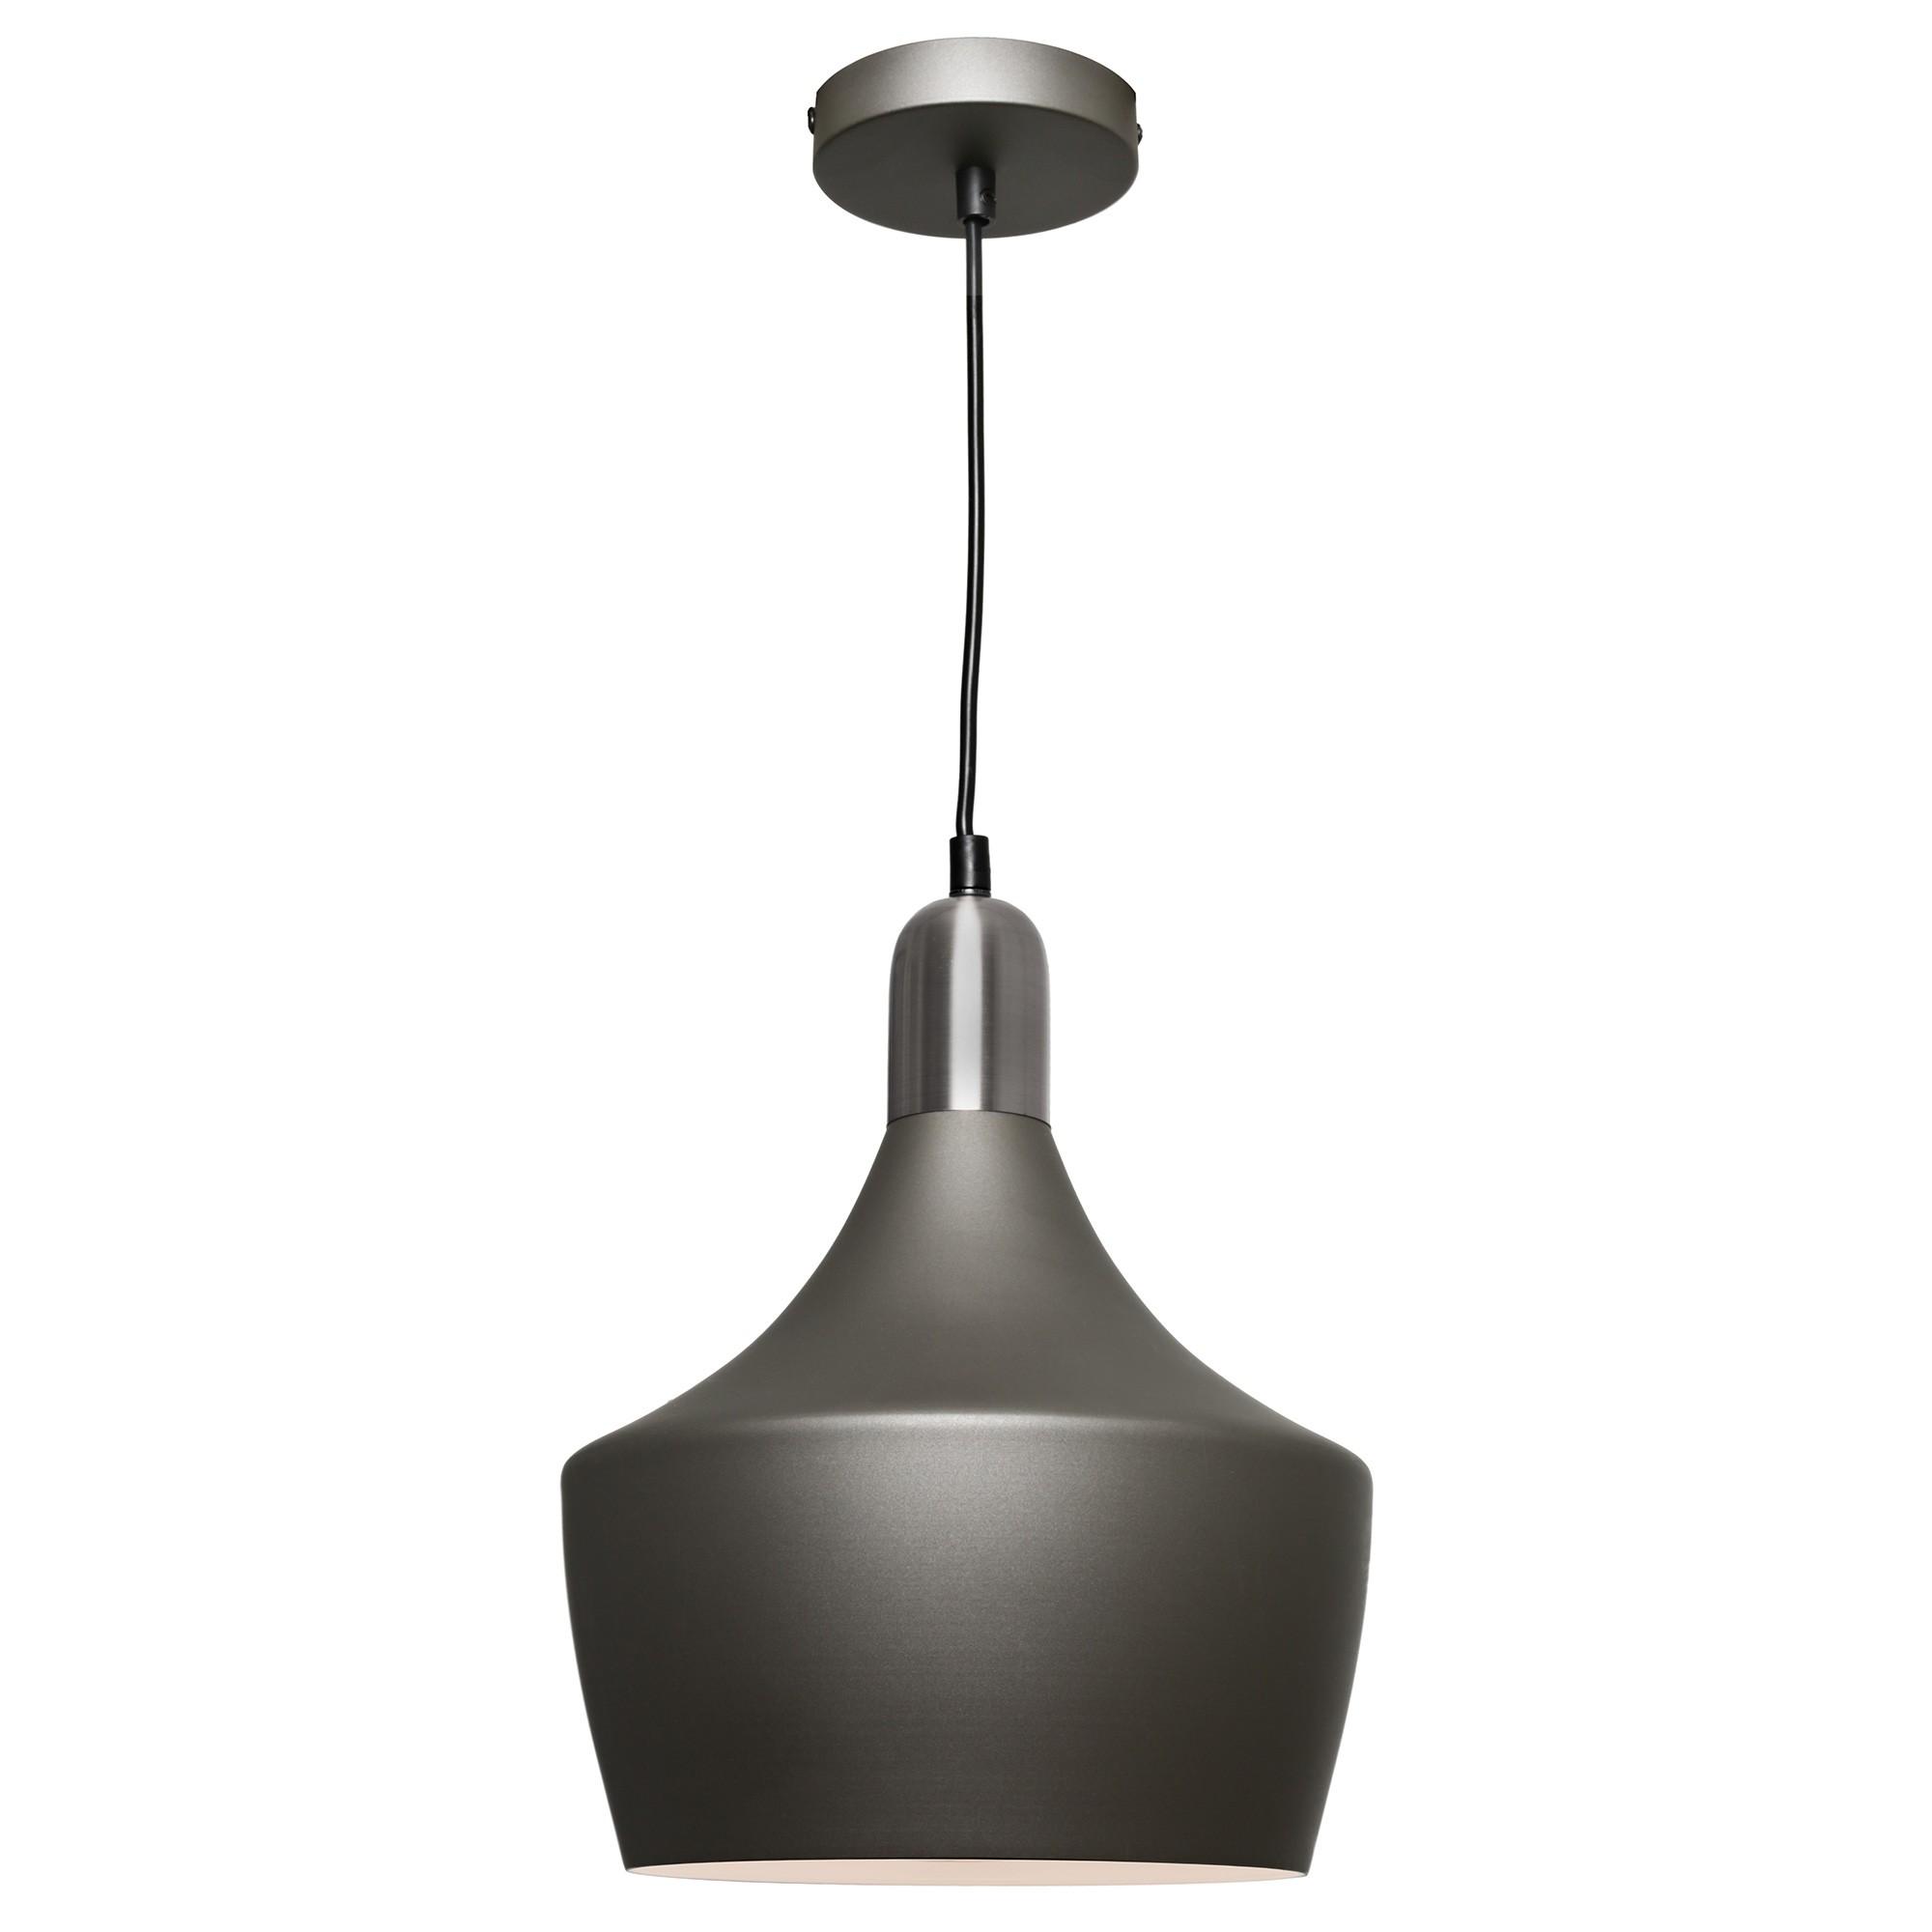 Bevo Metal Pendant Light, Cup, Charcoal / Satin Chrome